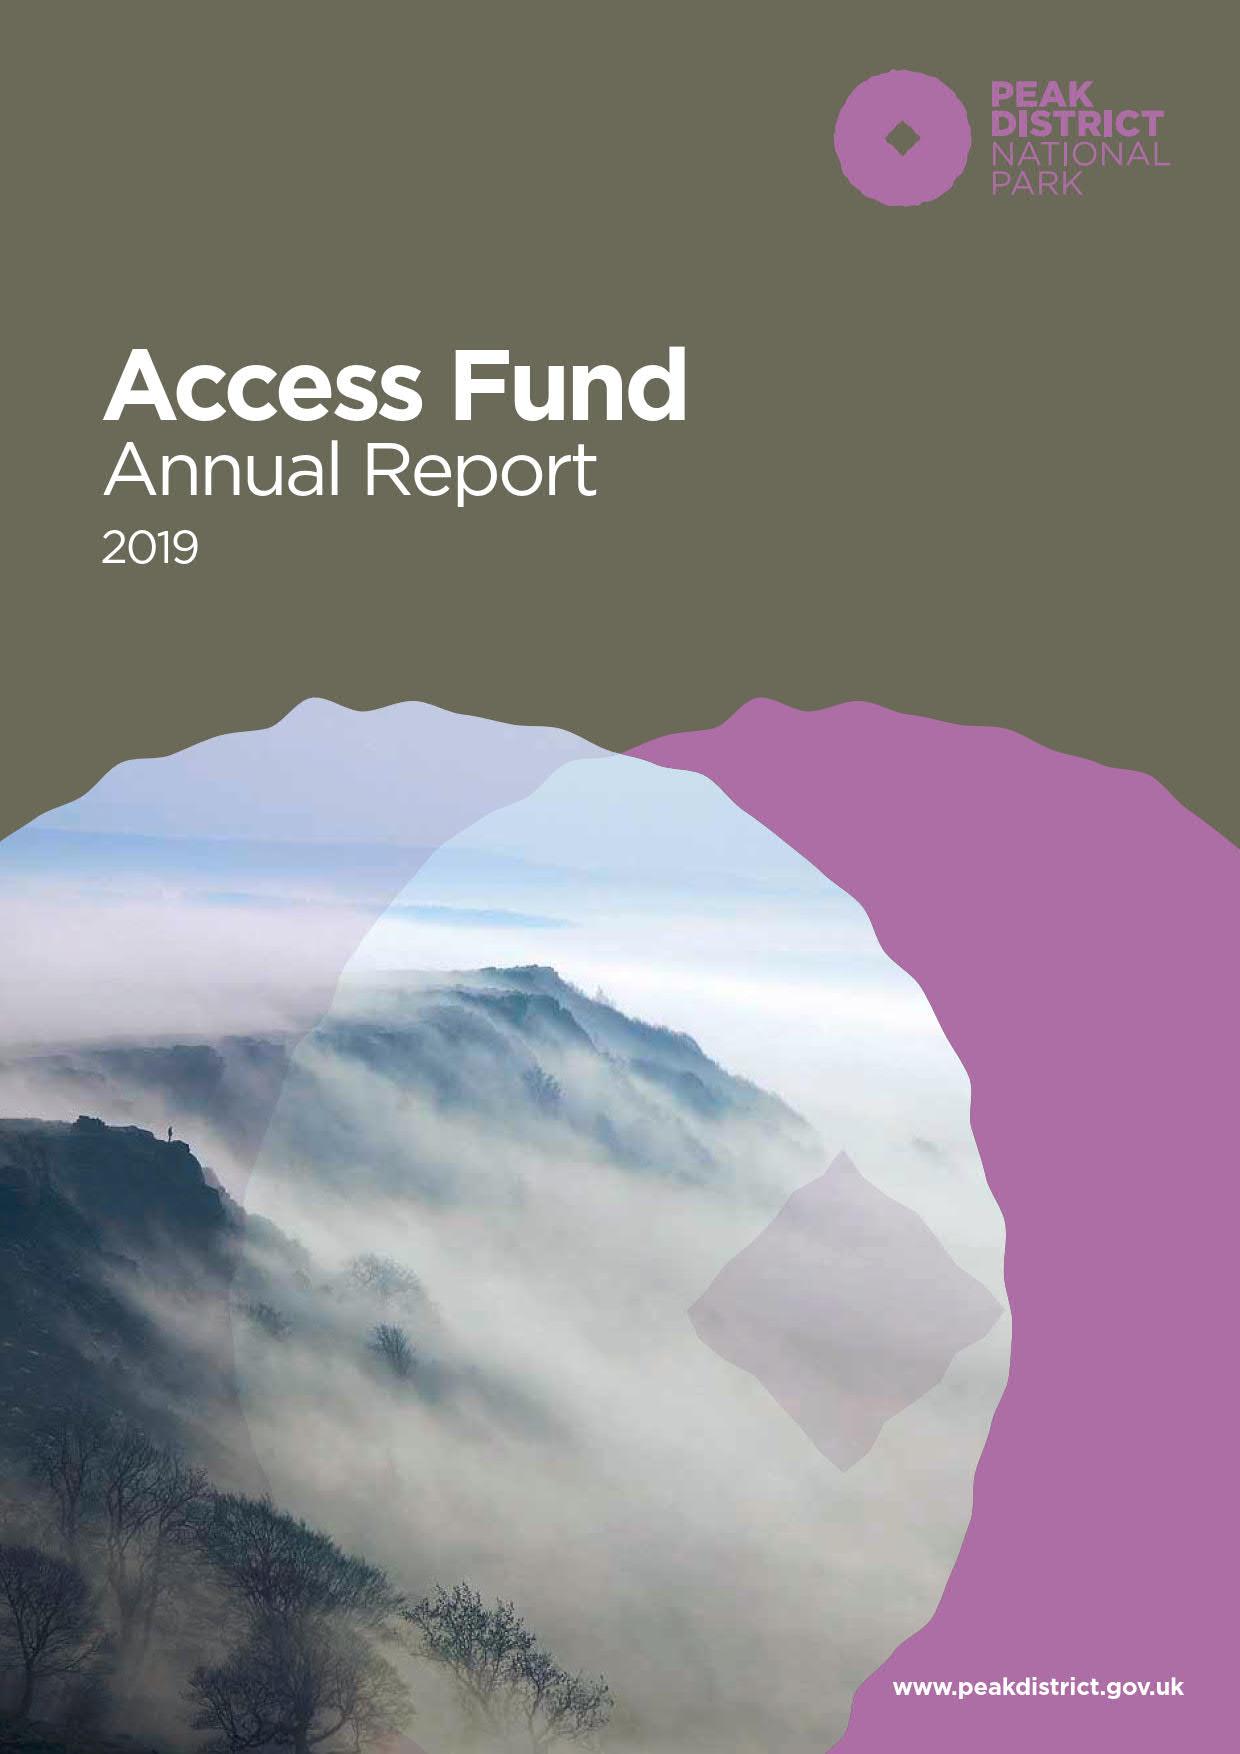 Access Fund Annual Report 2019